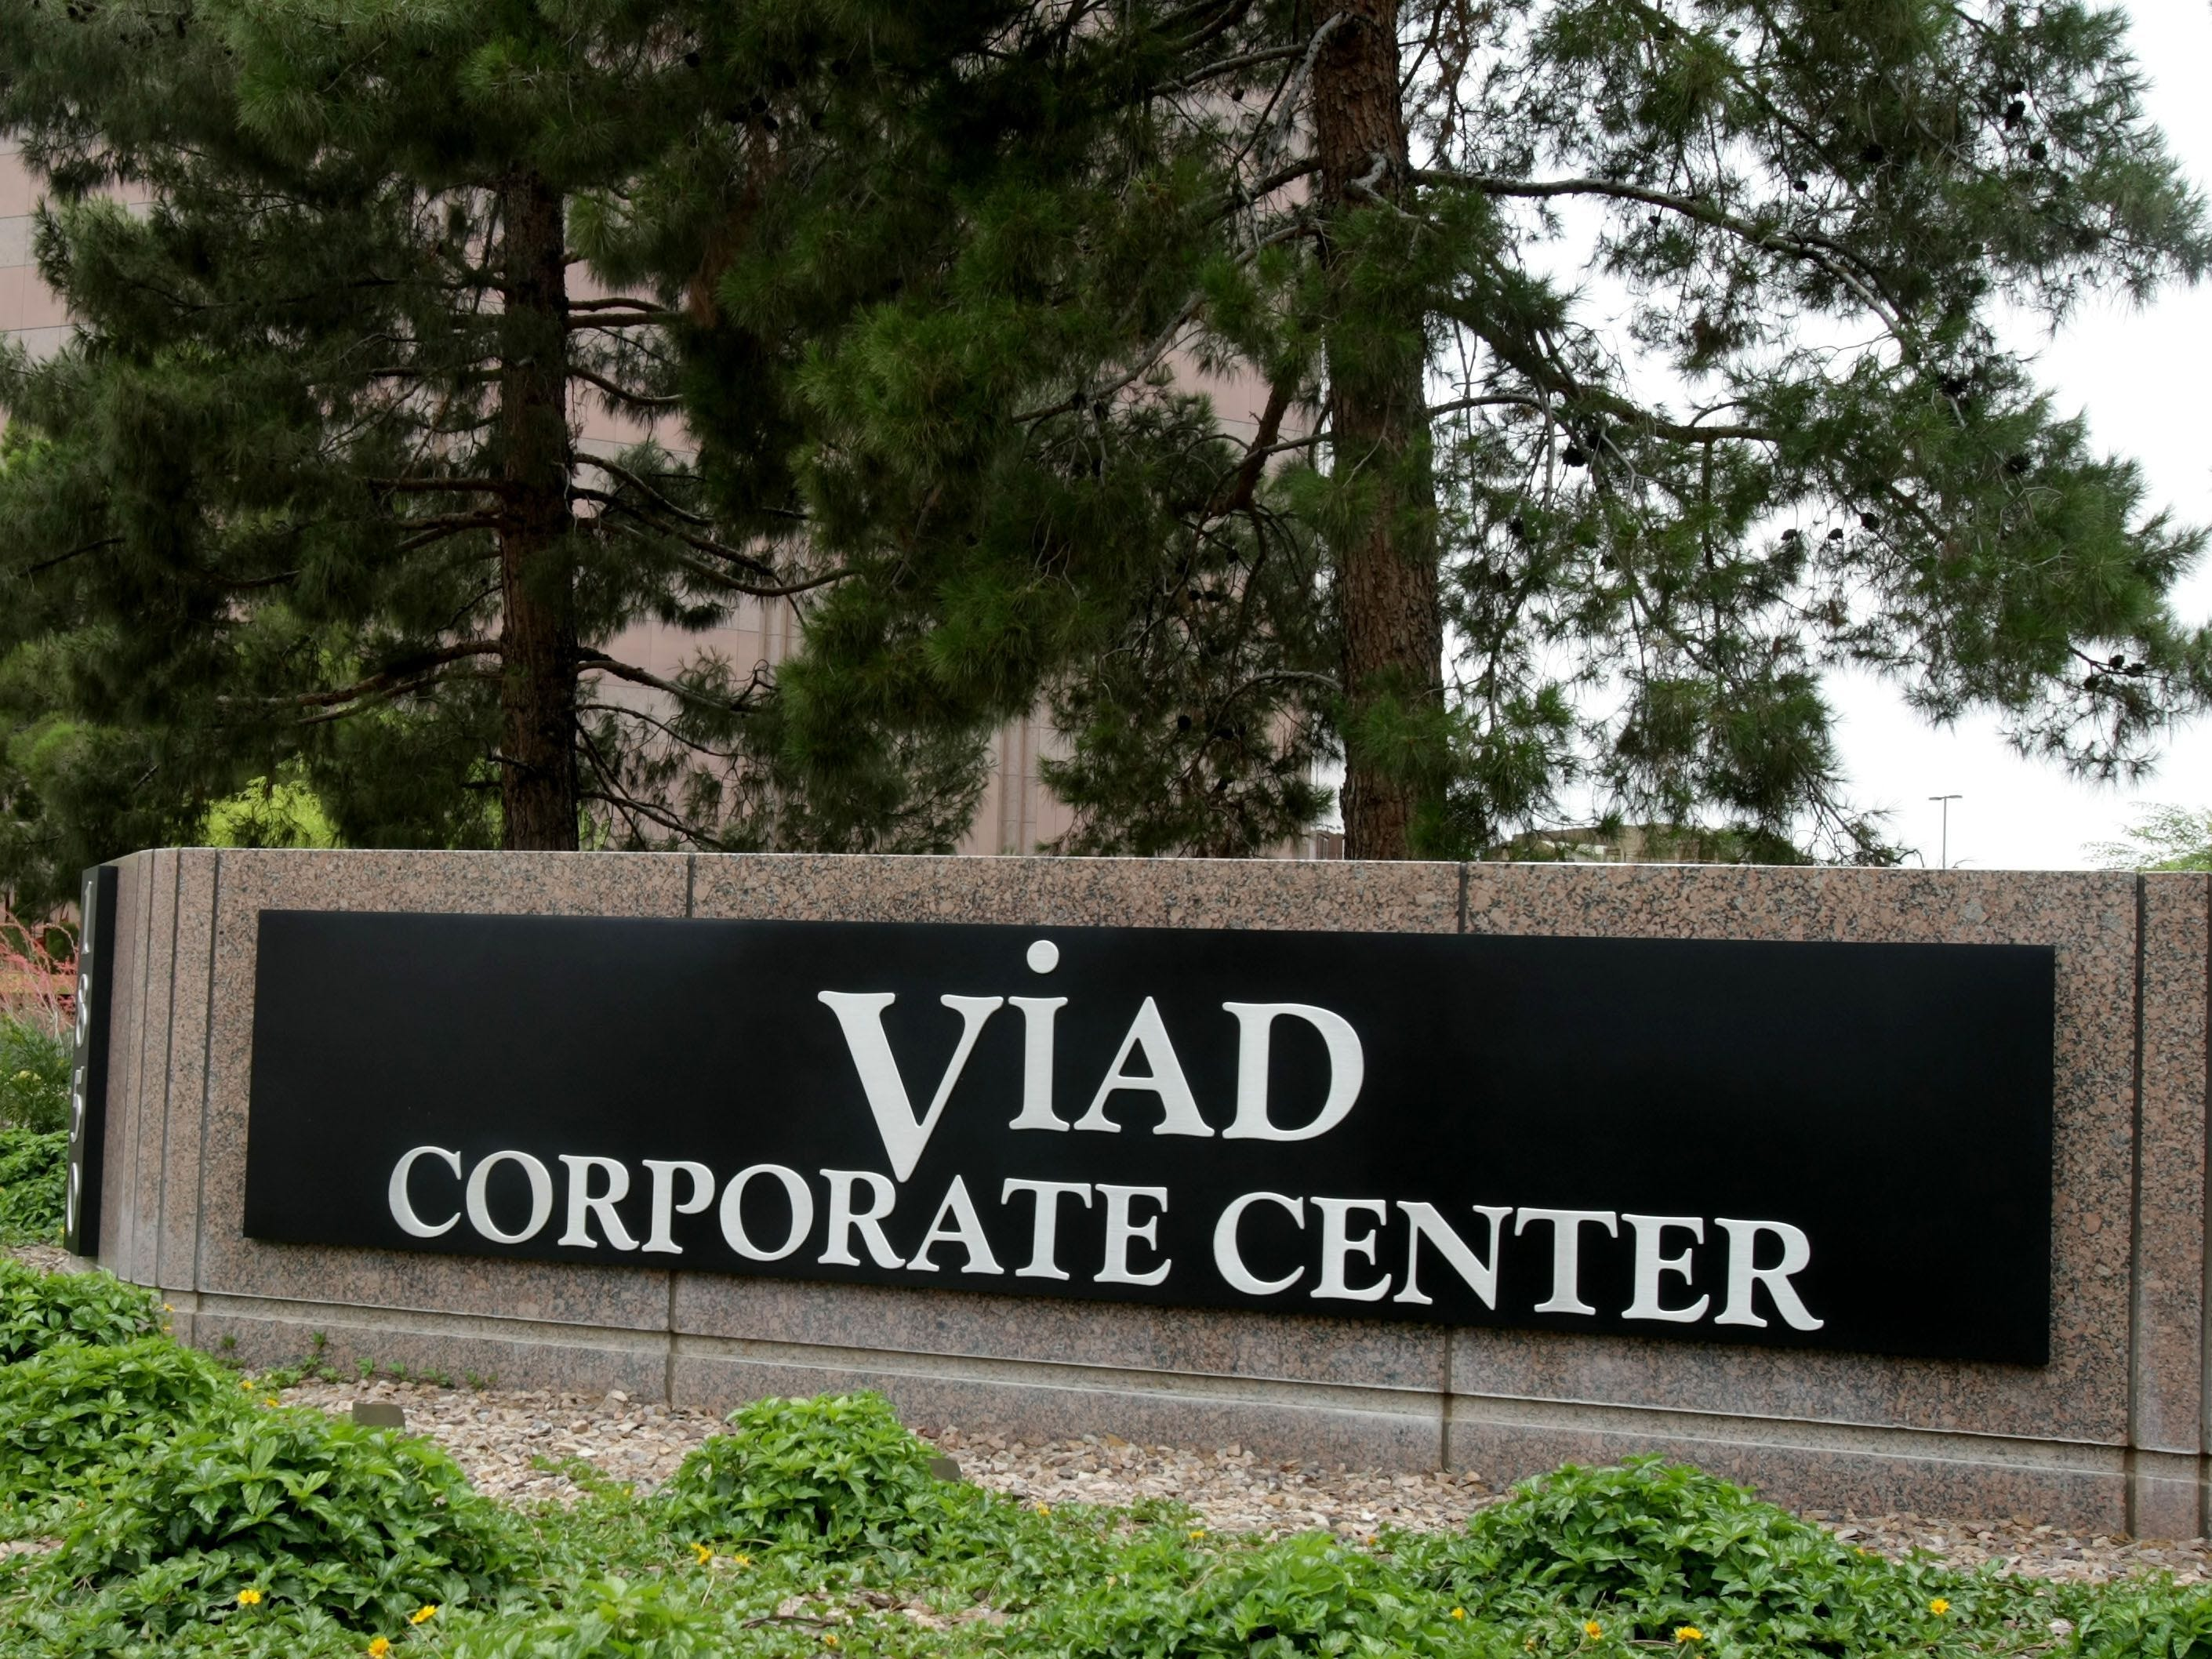 Viad Corp.'s Steven Moster: Summary compensation: $3,409,980. Adjusted compensation: $3,003,817. TTM profit: $41 million. TTM revenue: $1.3 billion. 2017 stock: 26.5 percent. Capitalization: $1.2 billion.